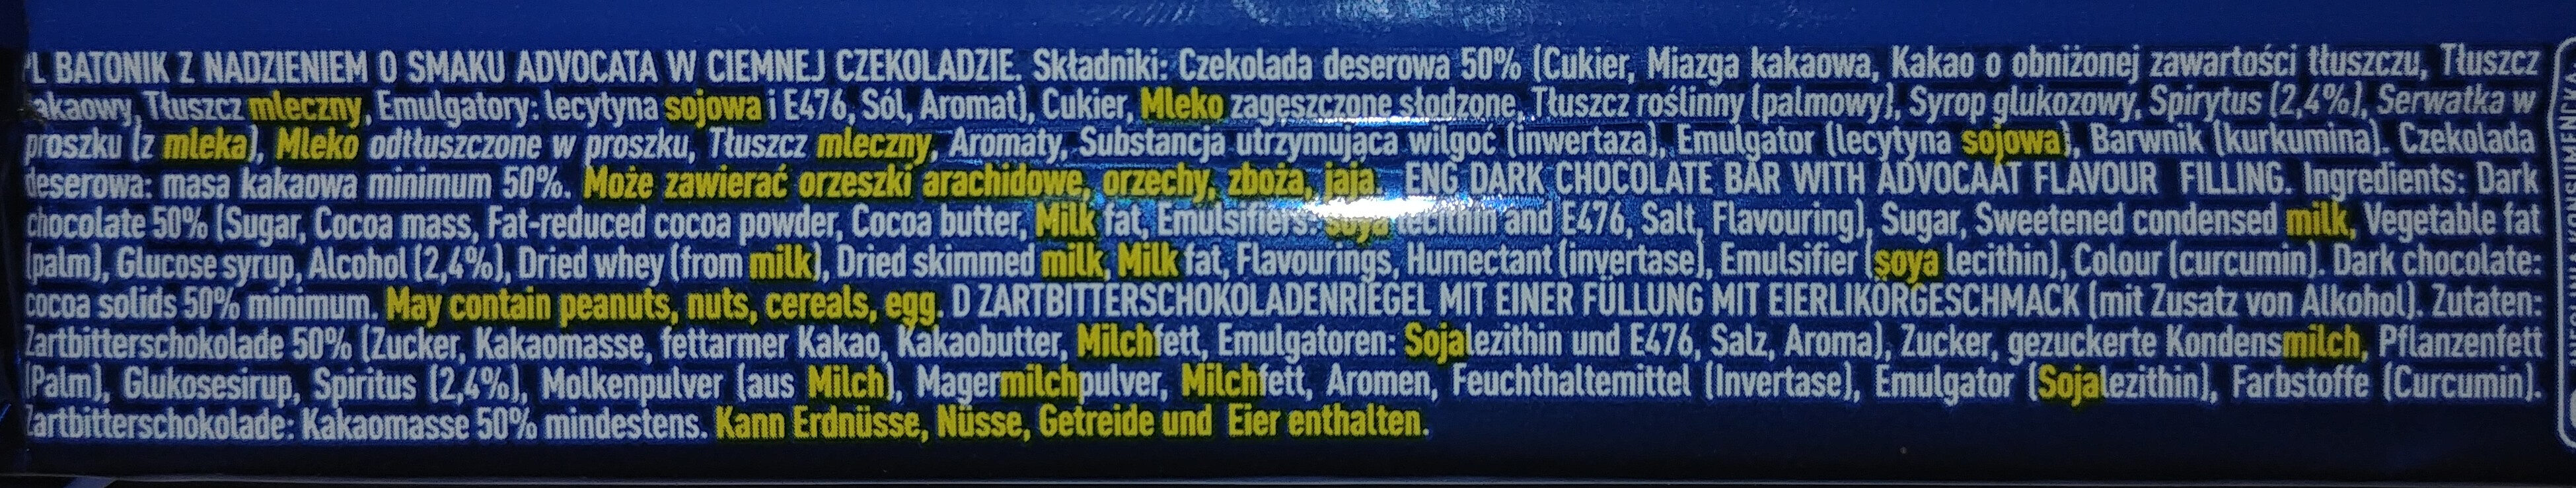 E. Wedel Pawelek Advocat - Ingrédients - pl